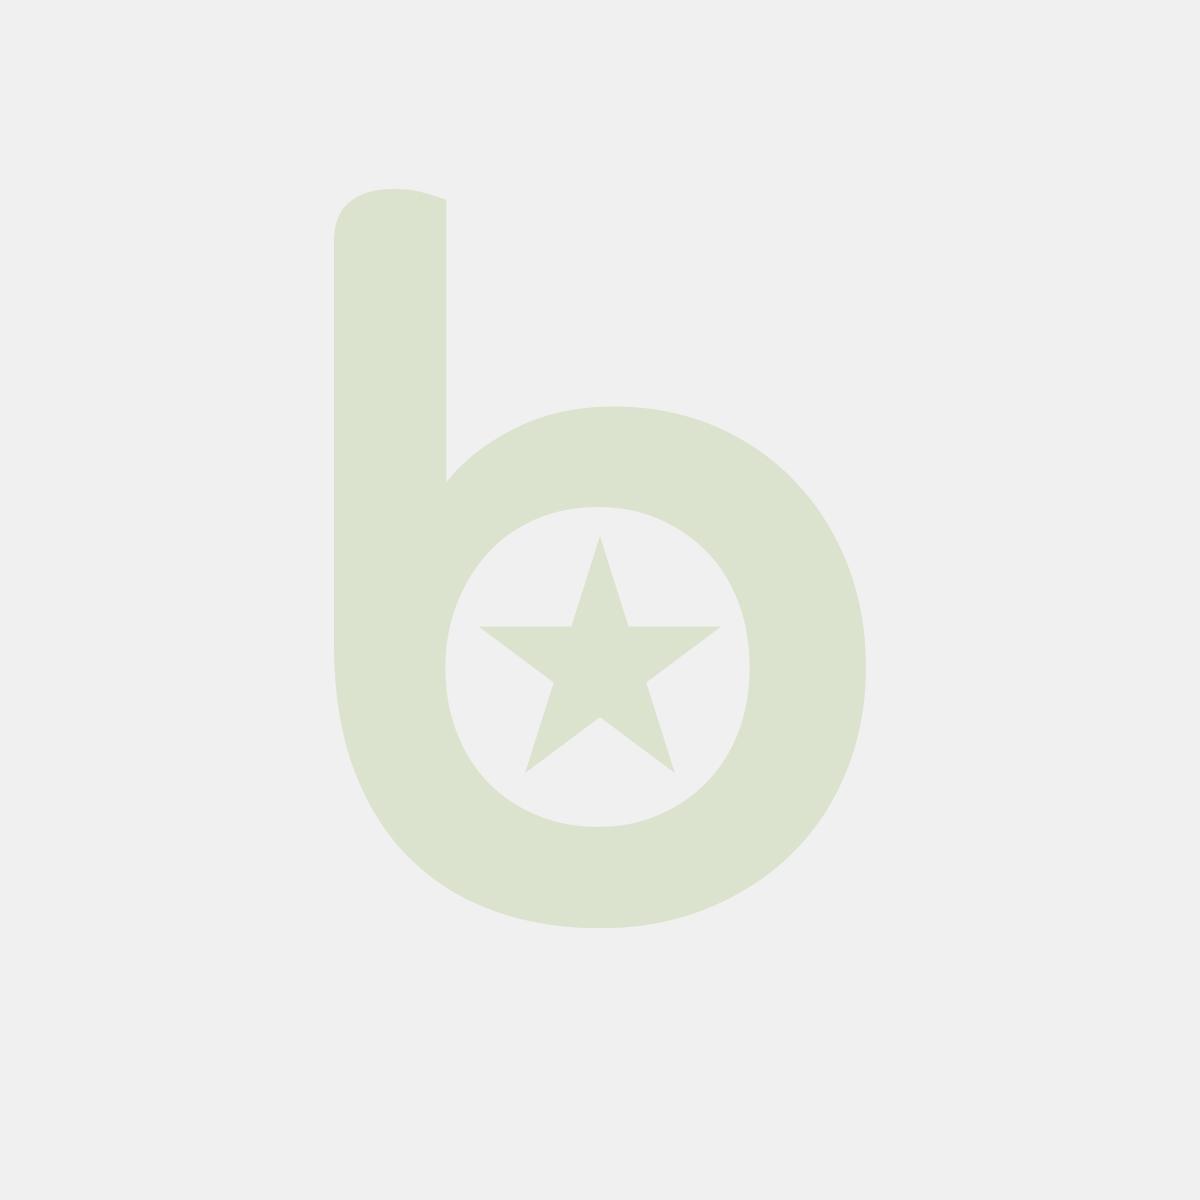 FINGERFOOD - pucharek PS kwadratowy 50ml transparentny 4,5x4,5x5 op. 384 sztuk